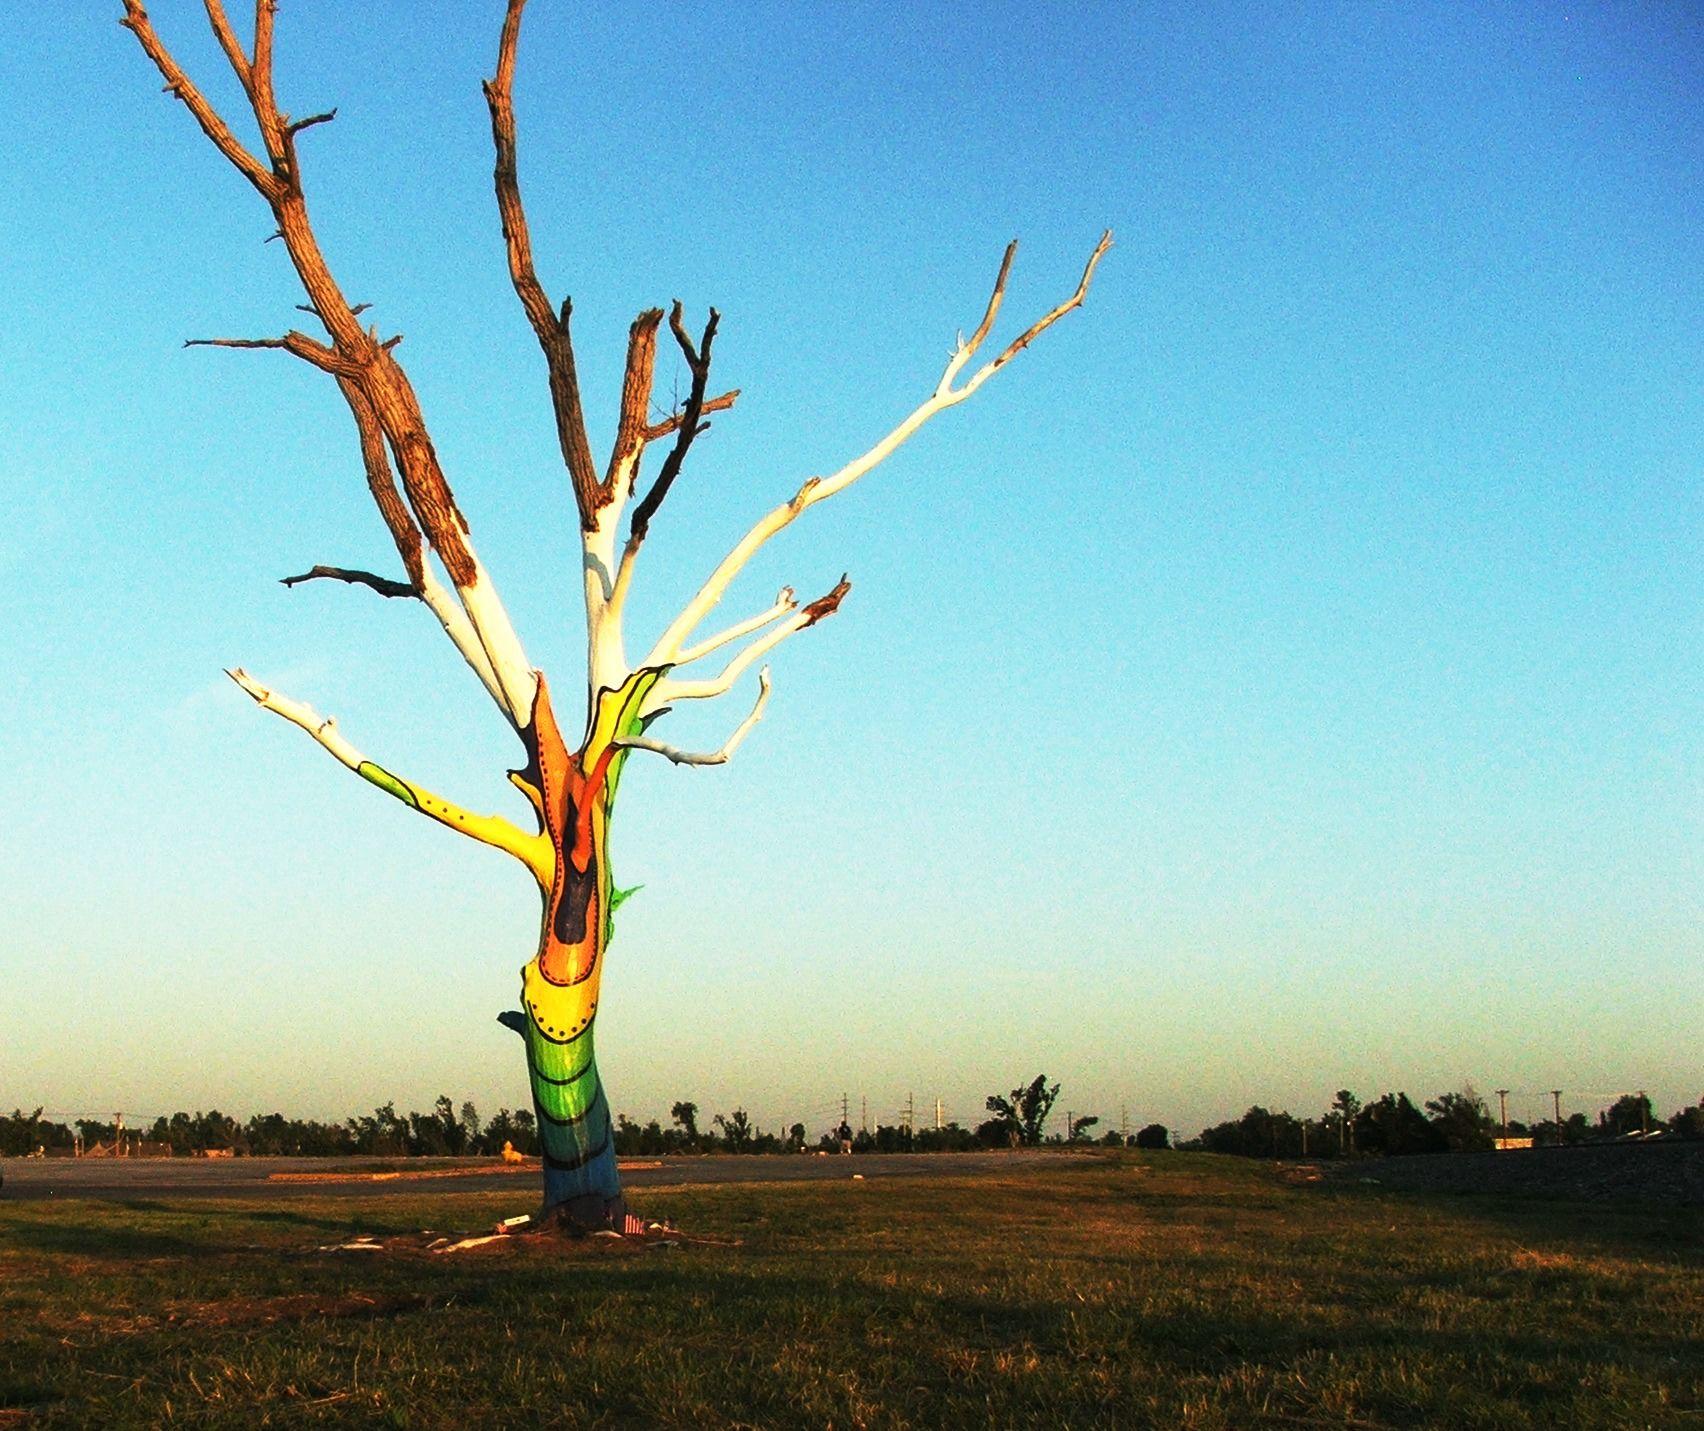 Joplin Tornado Spirit Tree Joplin Tornado Weather Storm Nature